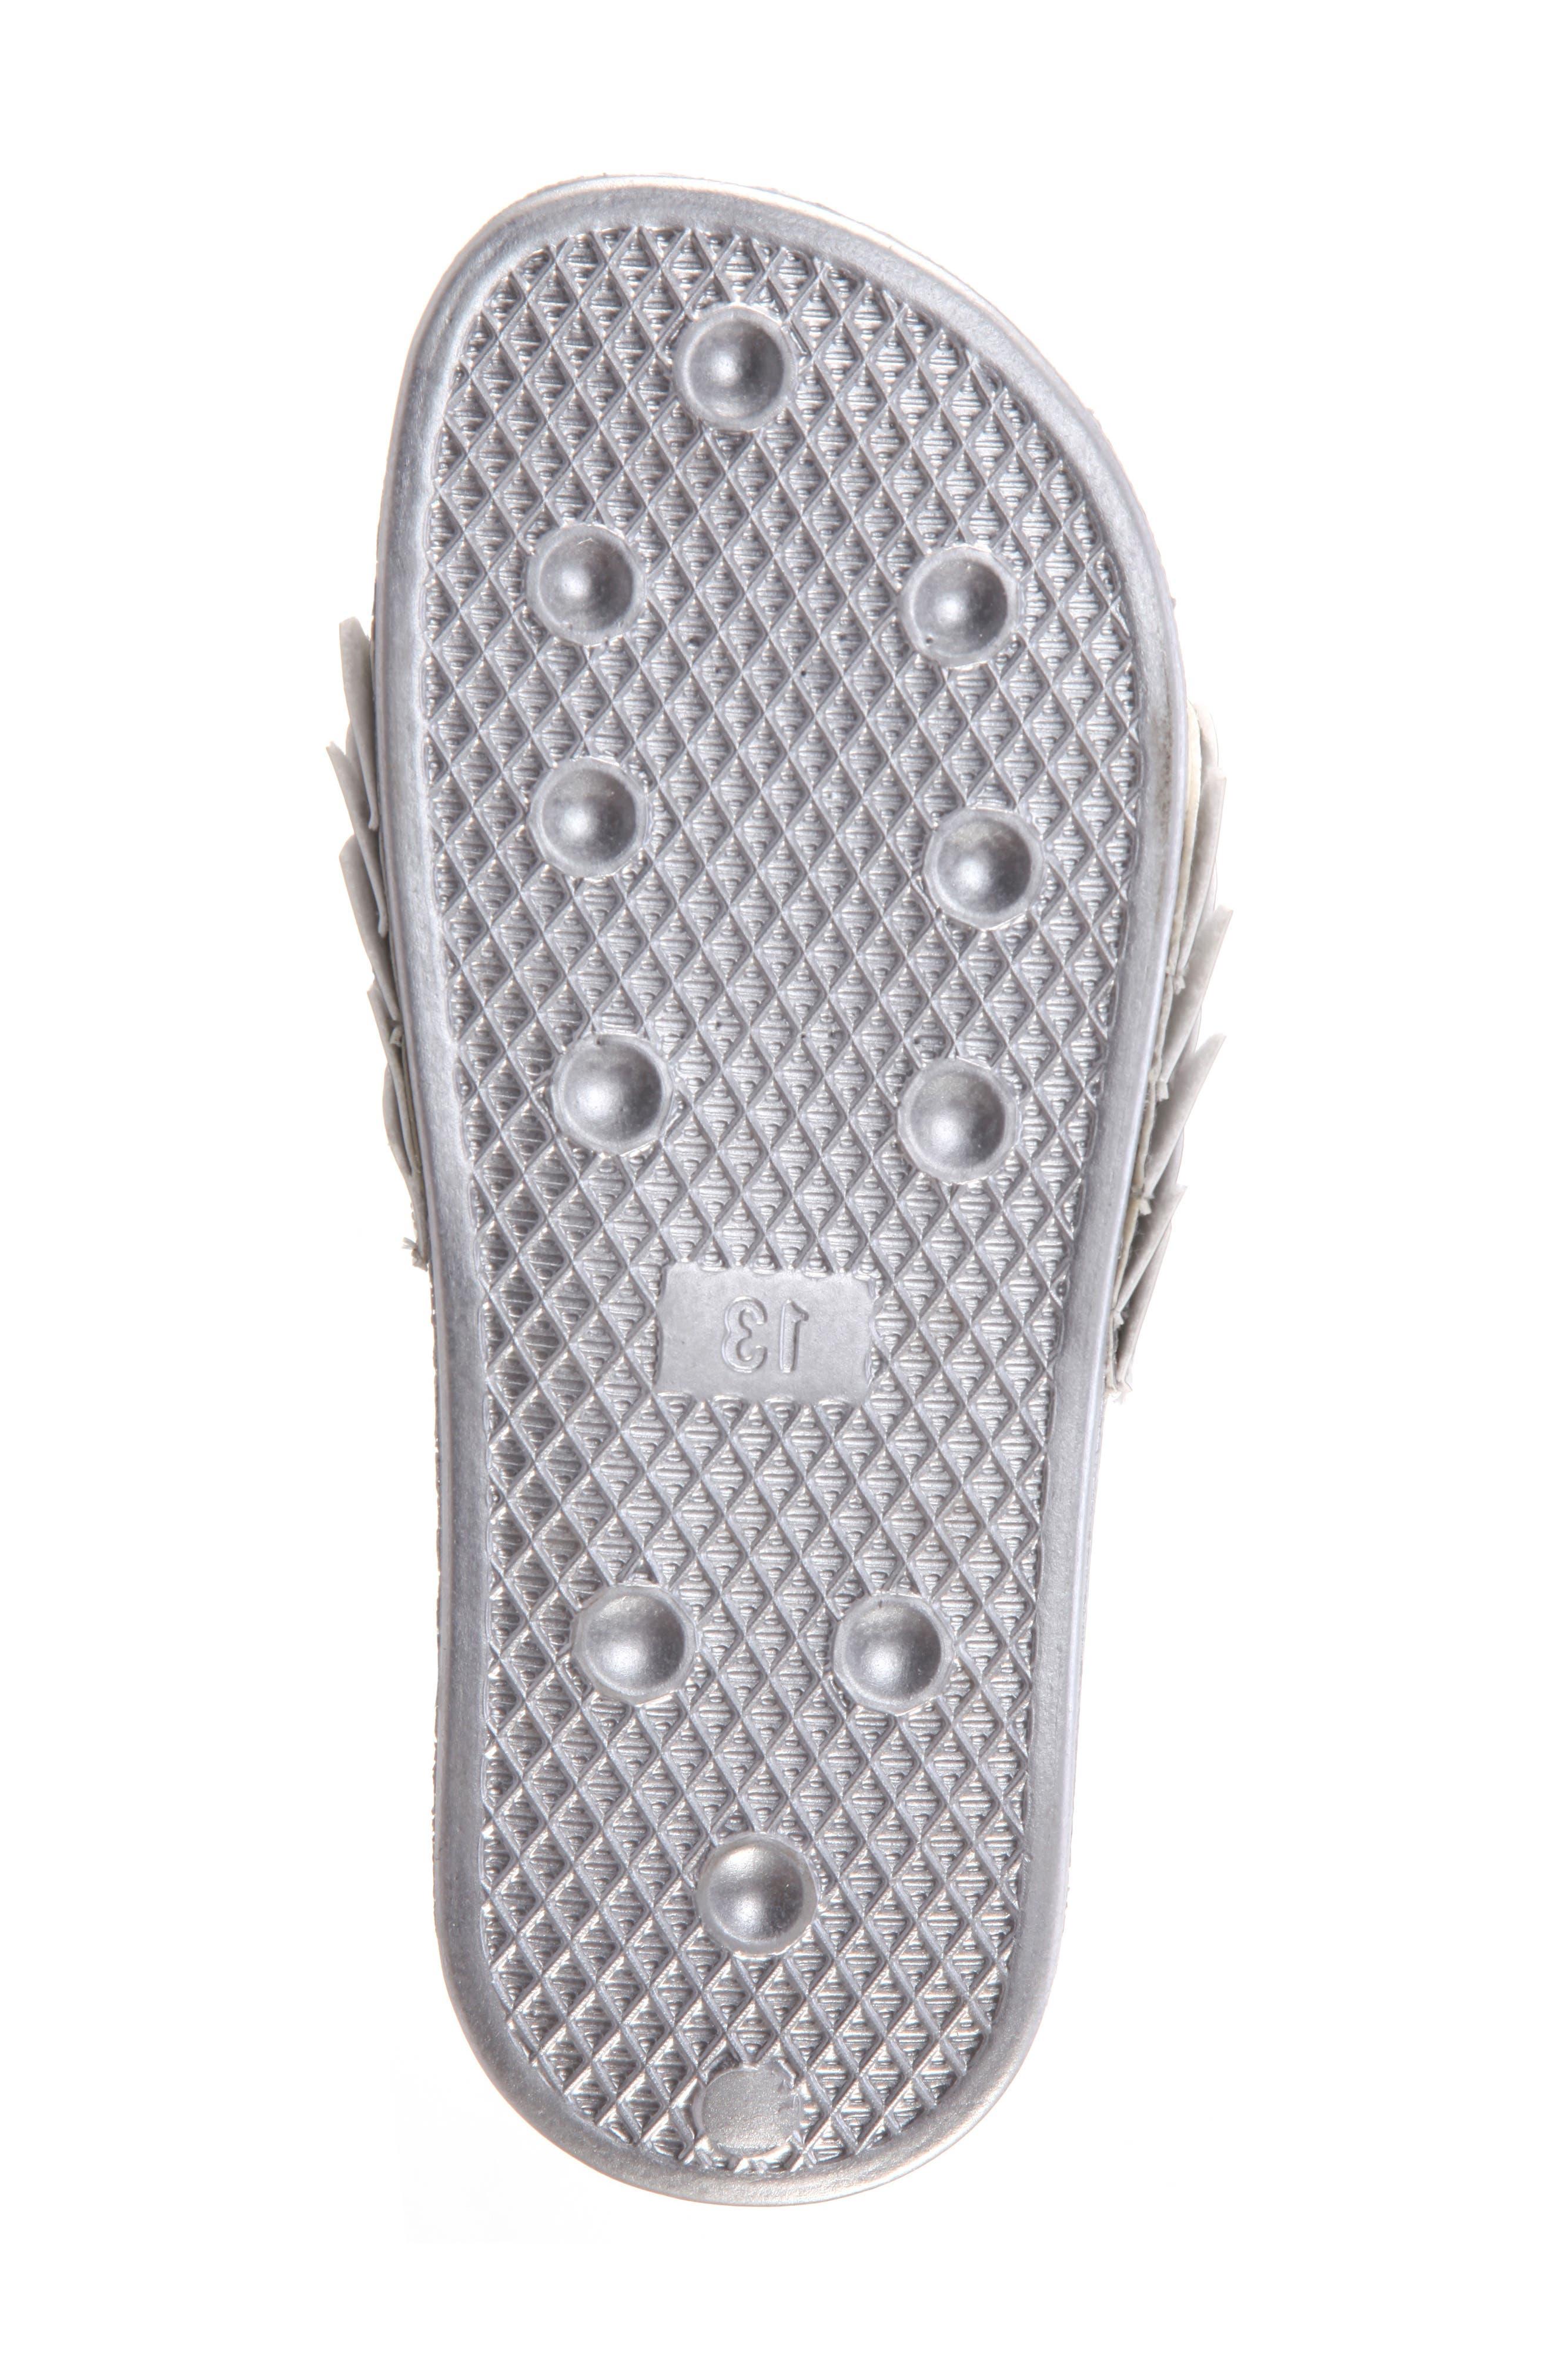 Mermaid Sport Slide Sandal,                             Alternate thumbnail 6, color,                             Silver Mirror Metallic